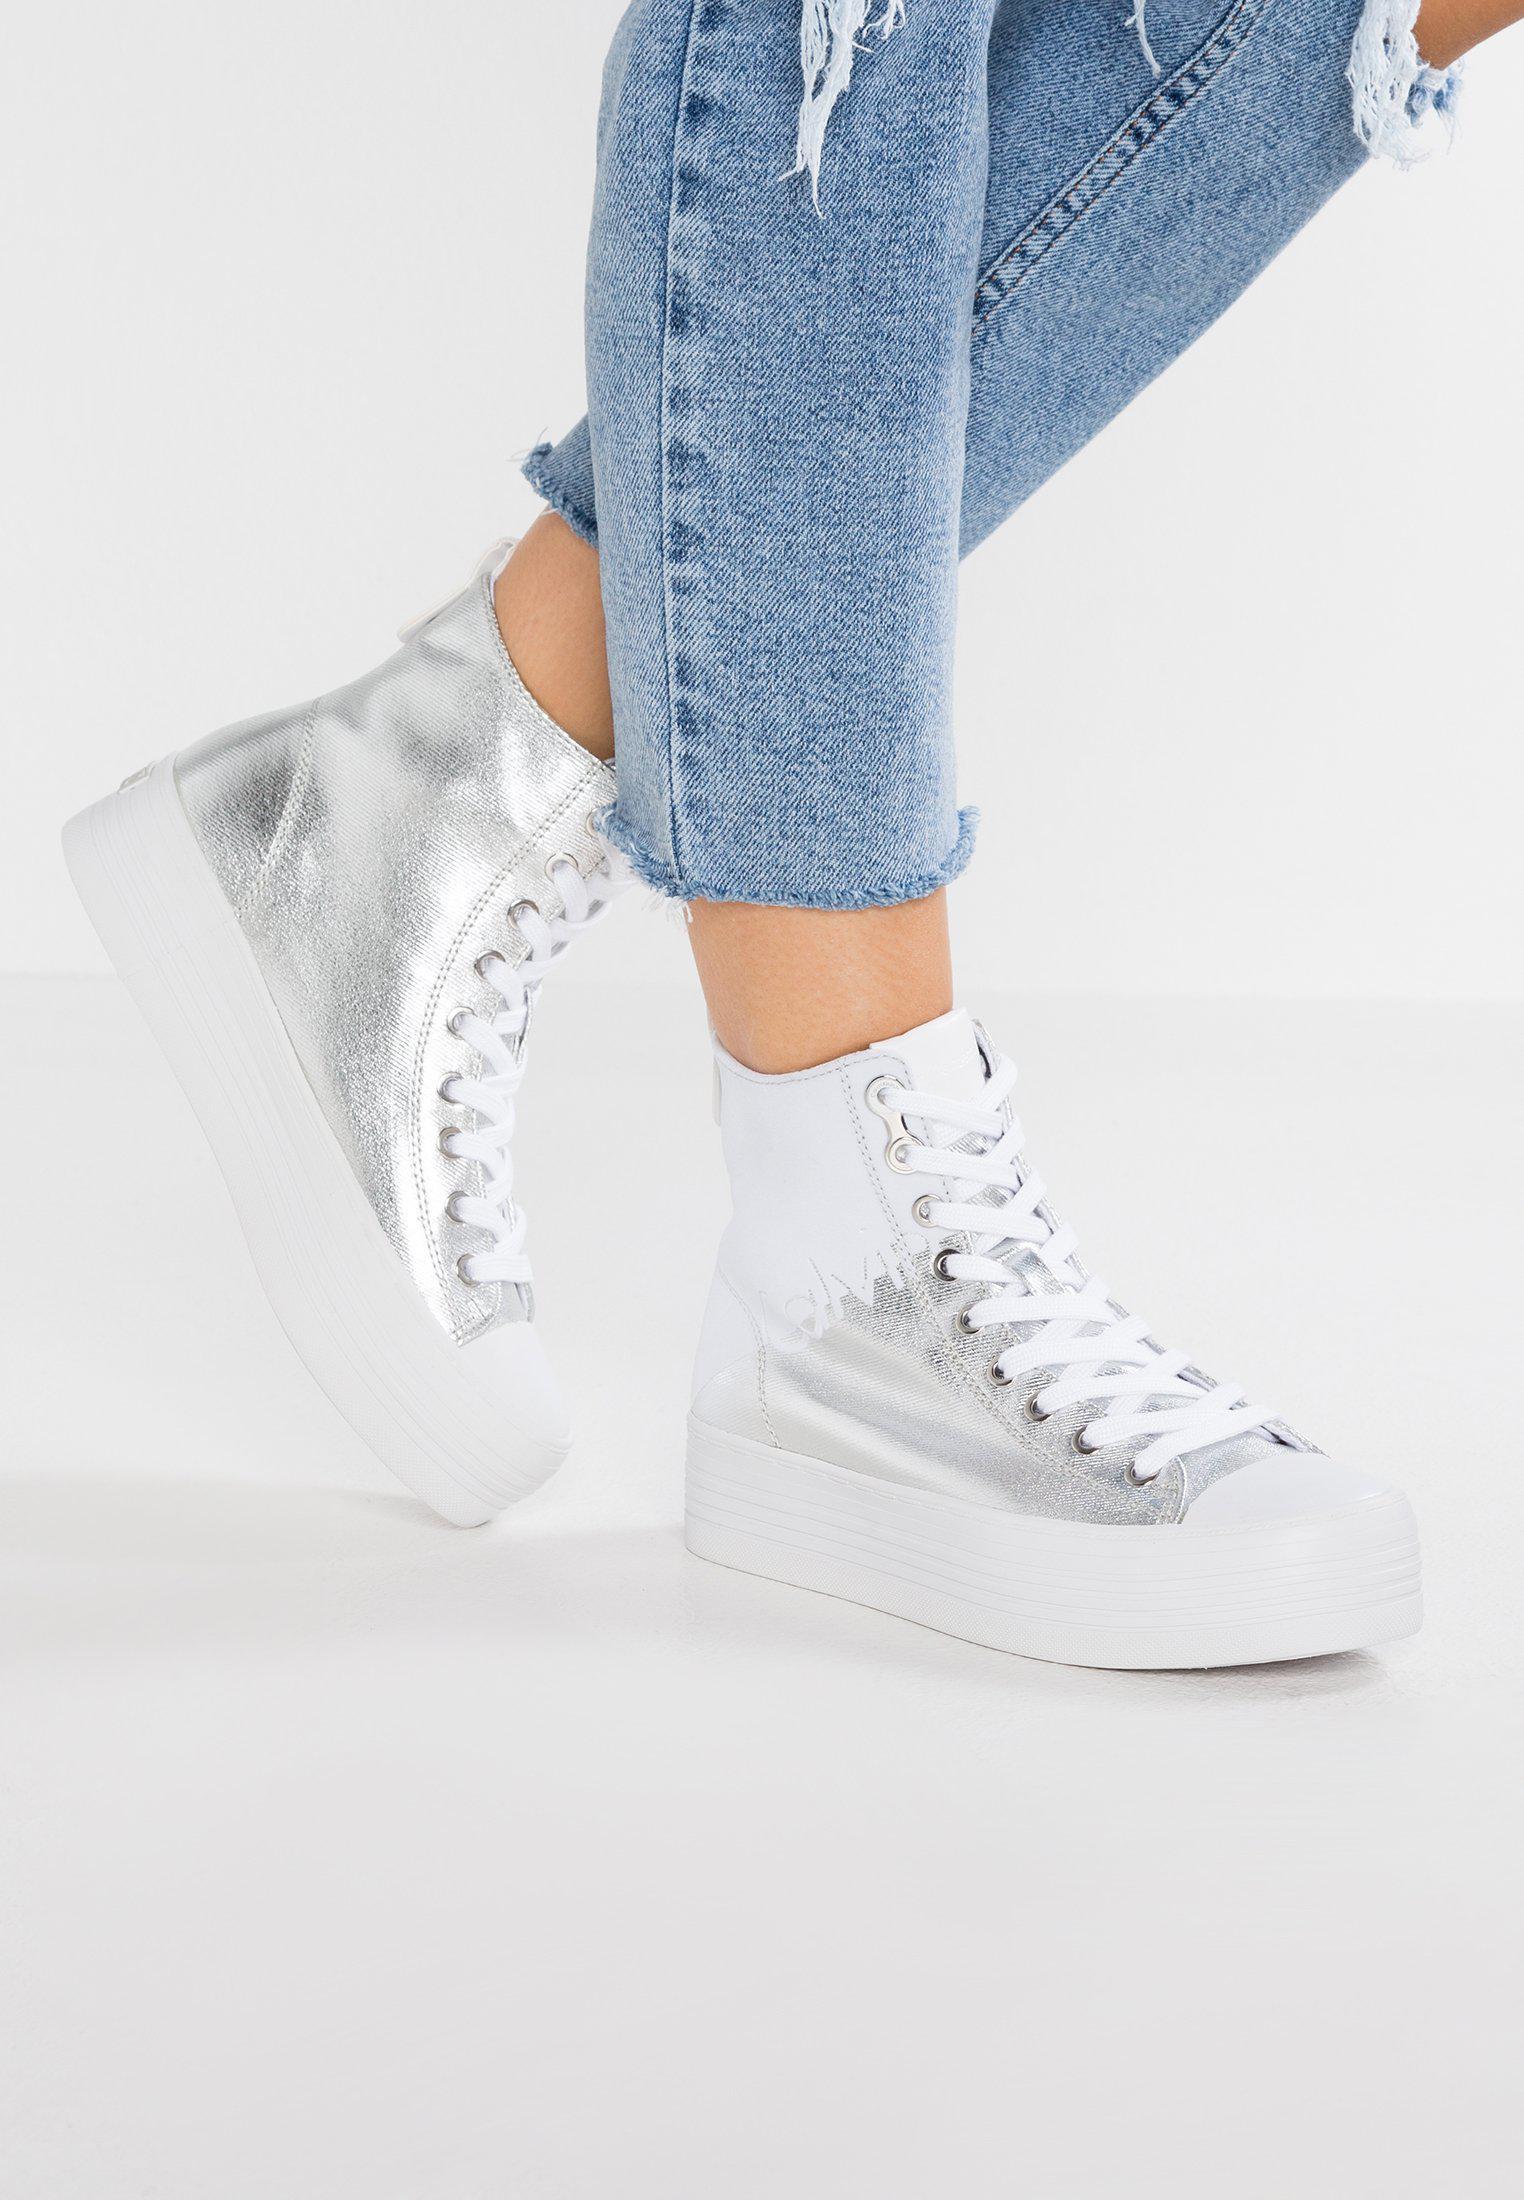 Calvin Klein JeansZAZAH - High-top trainers - white laXwROMH3